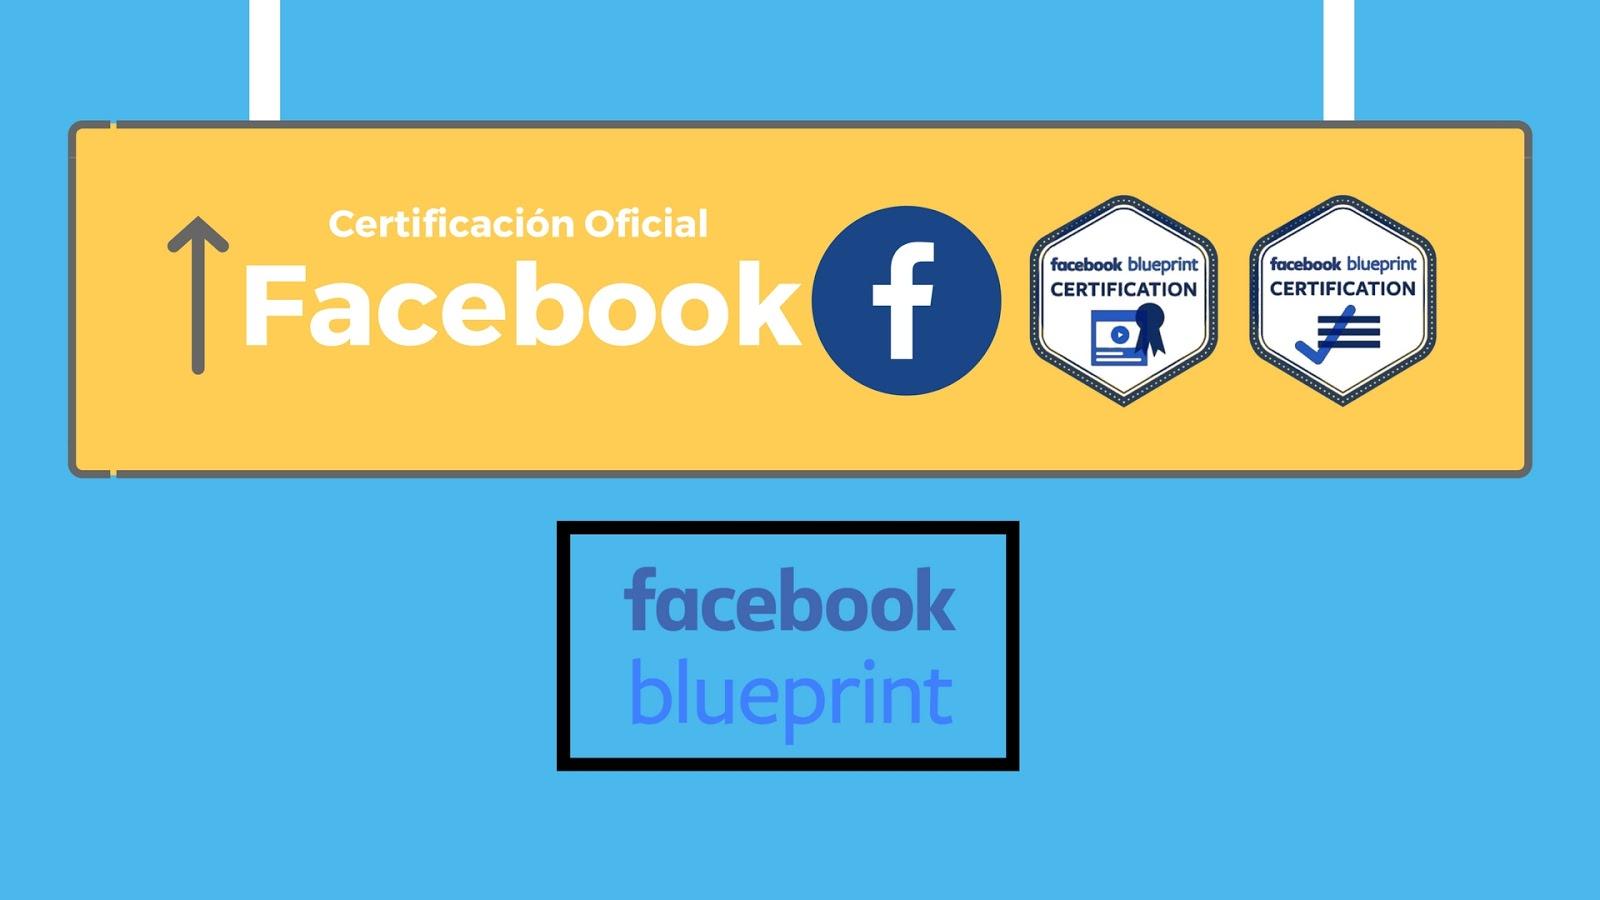 Certificacion Facebook